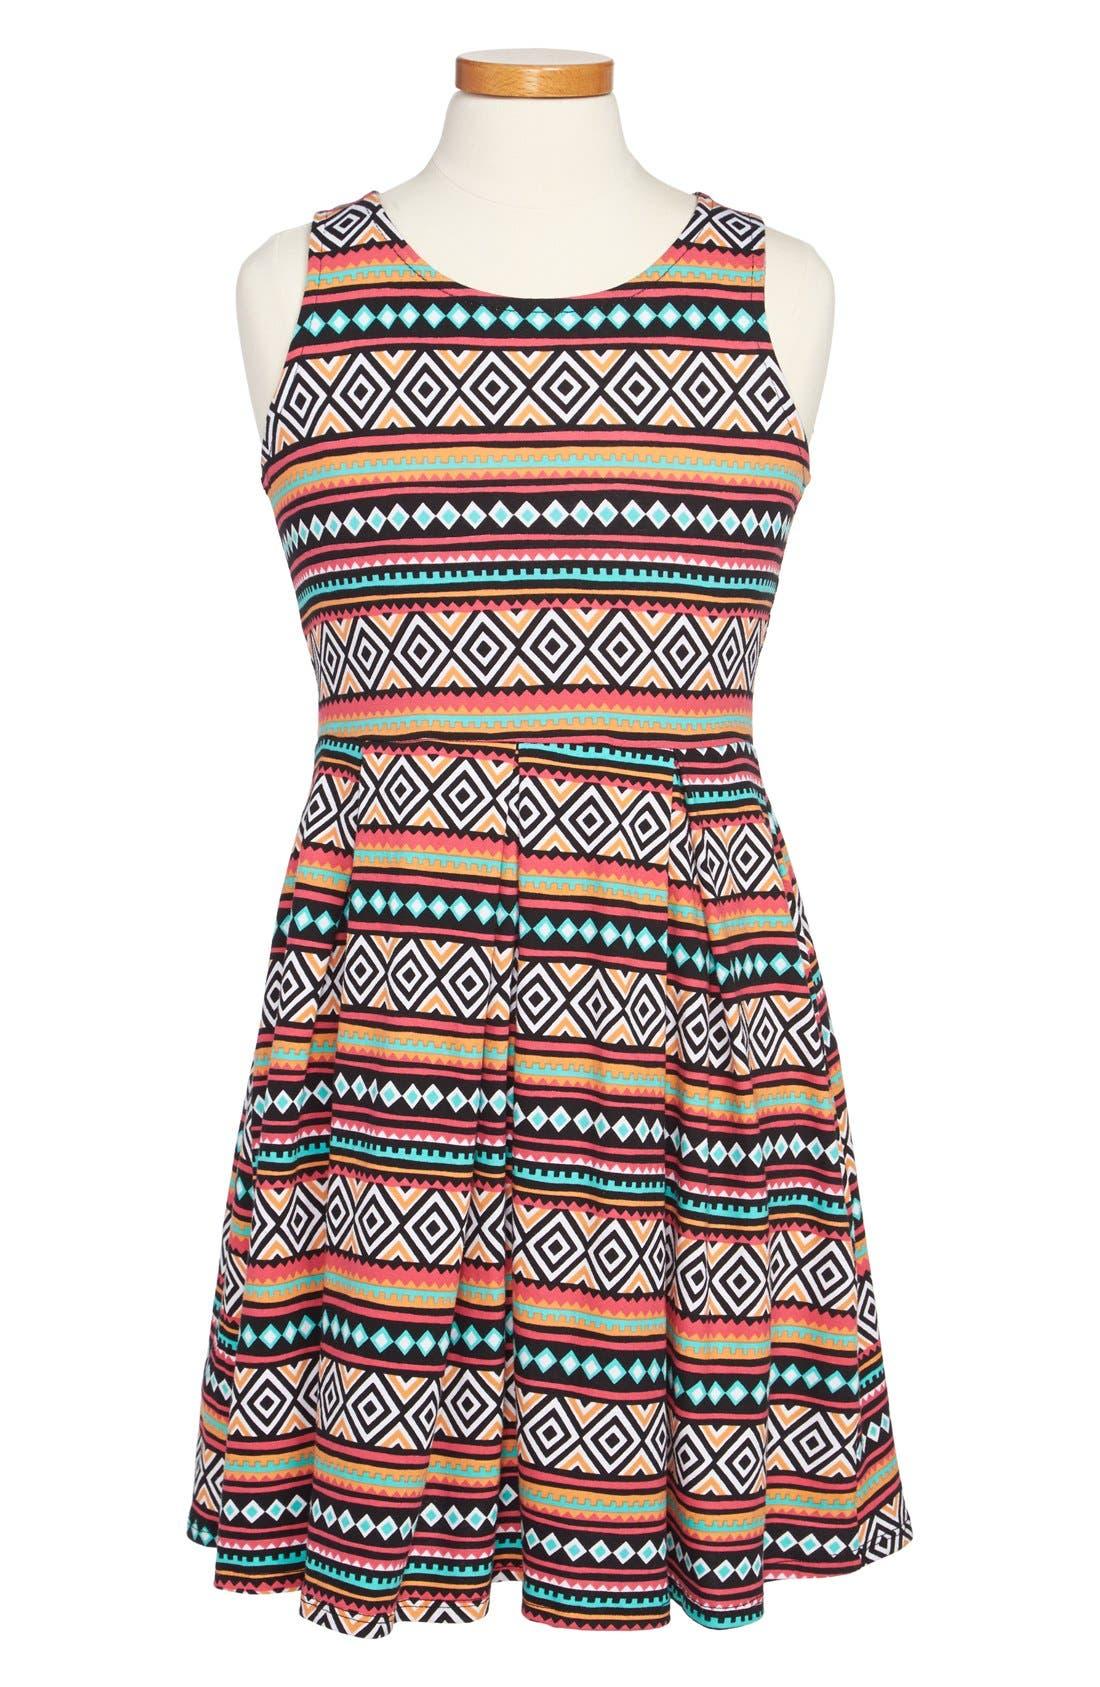 Alternate Image 1 Selected - Soprano Chevron Print Skater Dress (Big Girls)